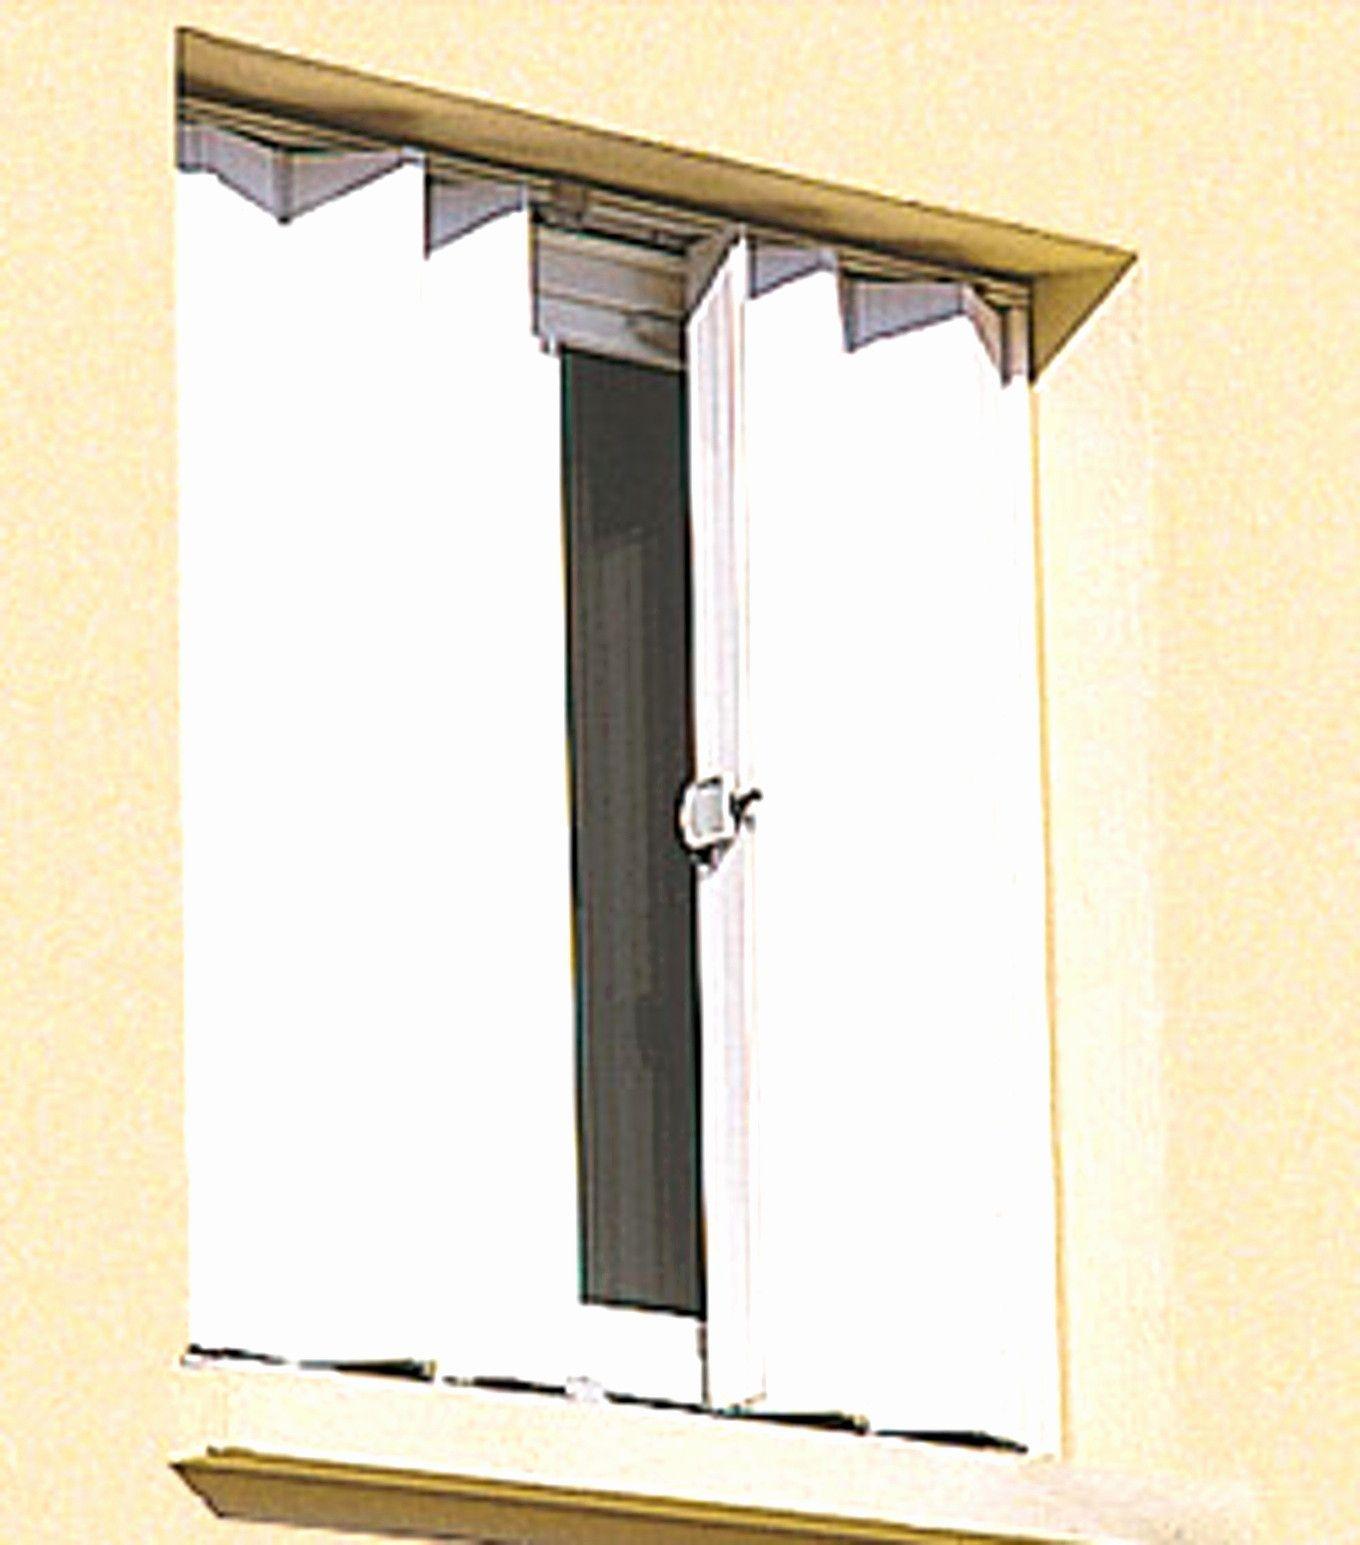 New Volet Pliant Pvc Brico Depot Bathroom Medicine Cabinet Home Home Decor